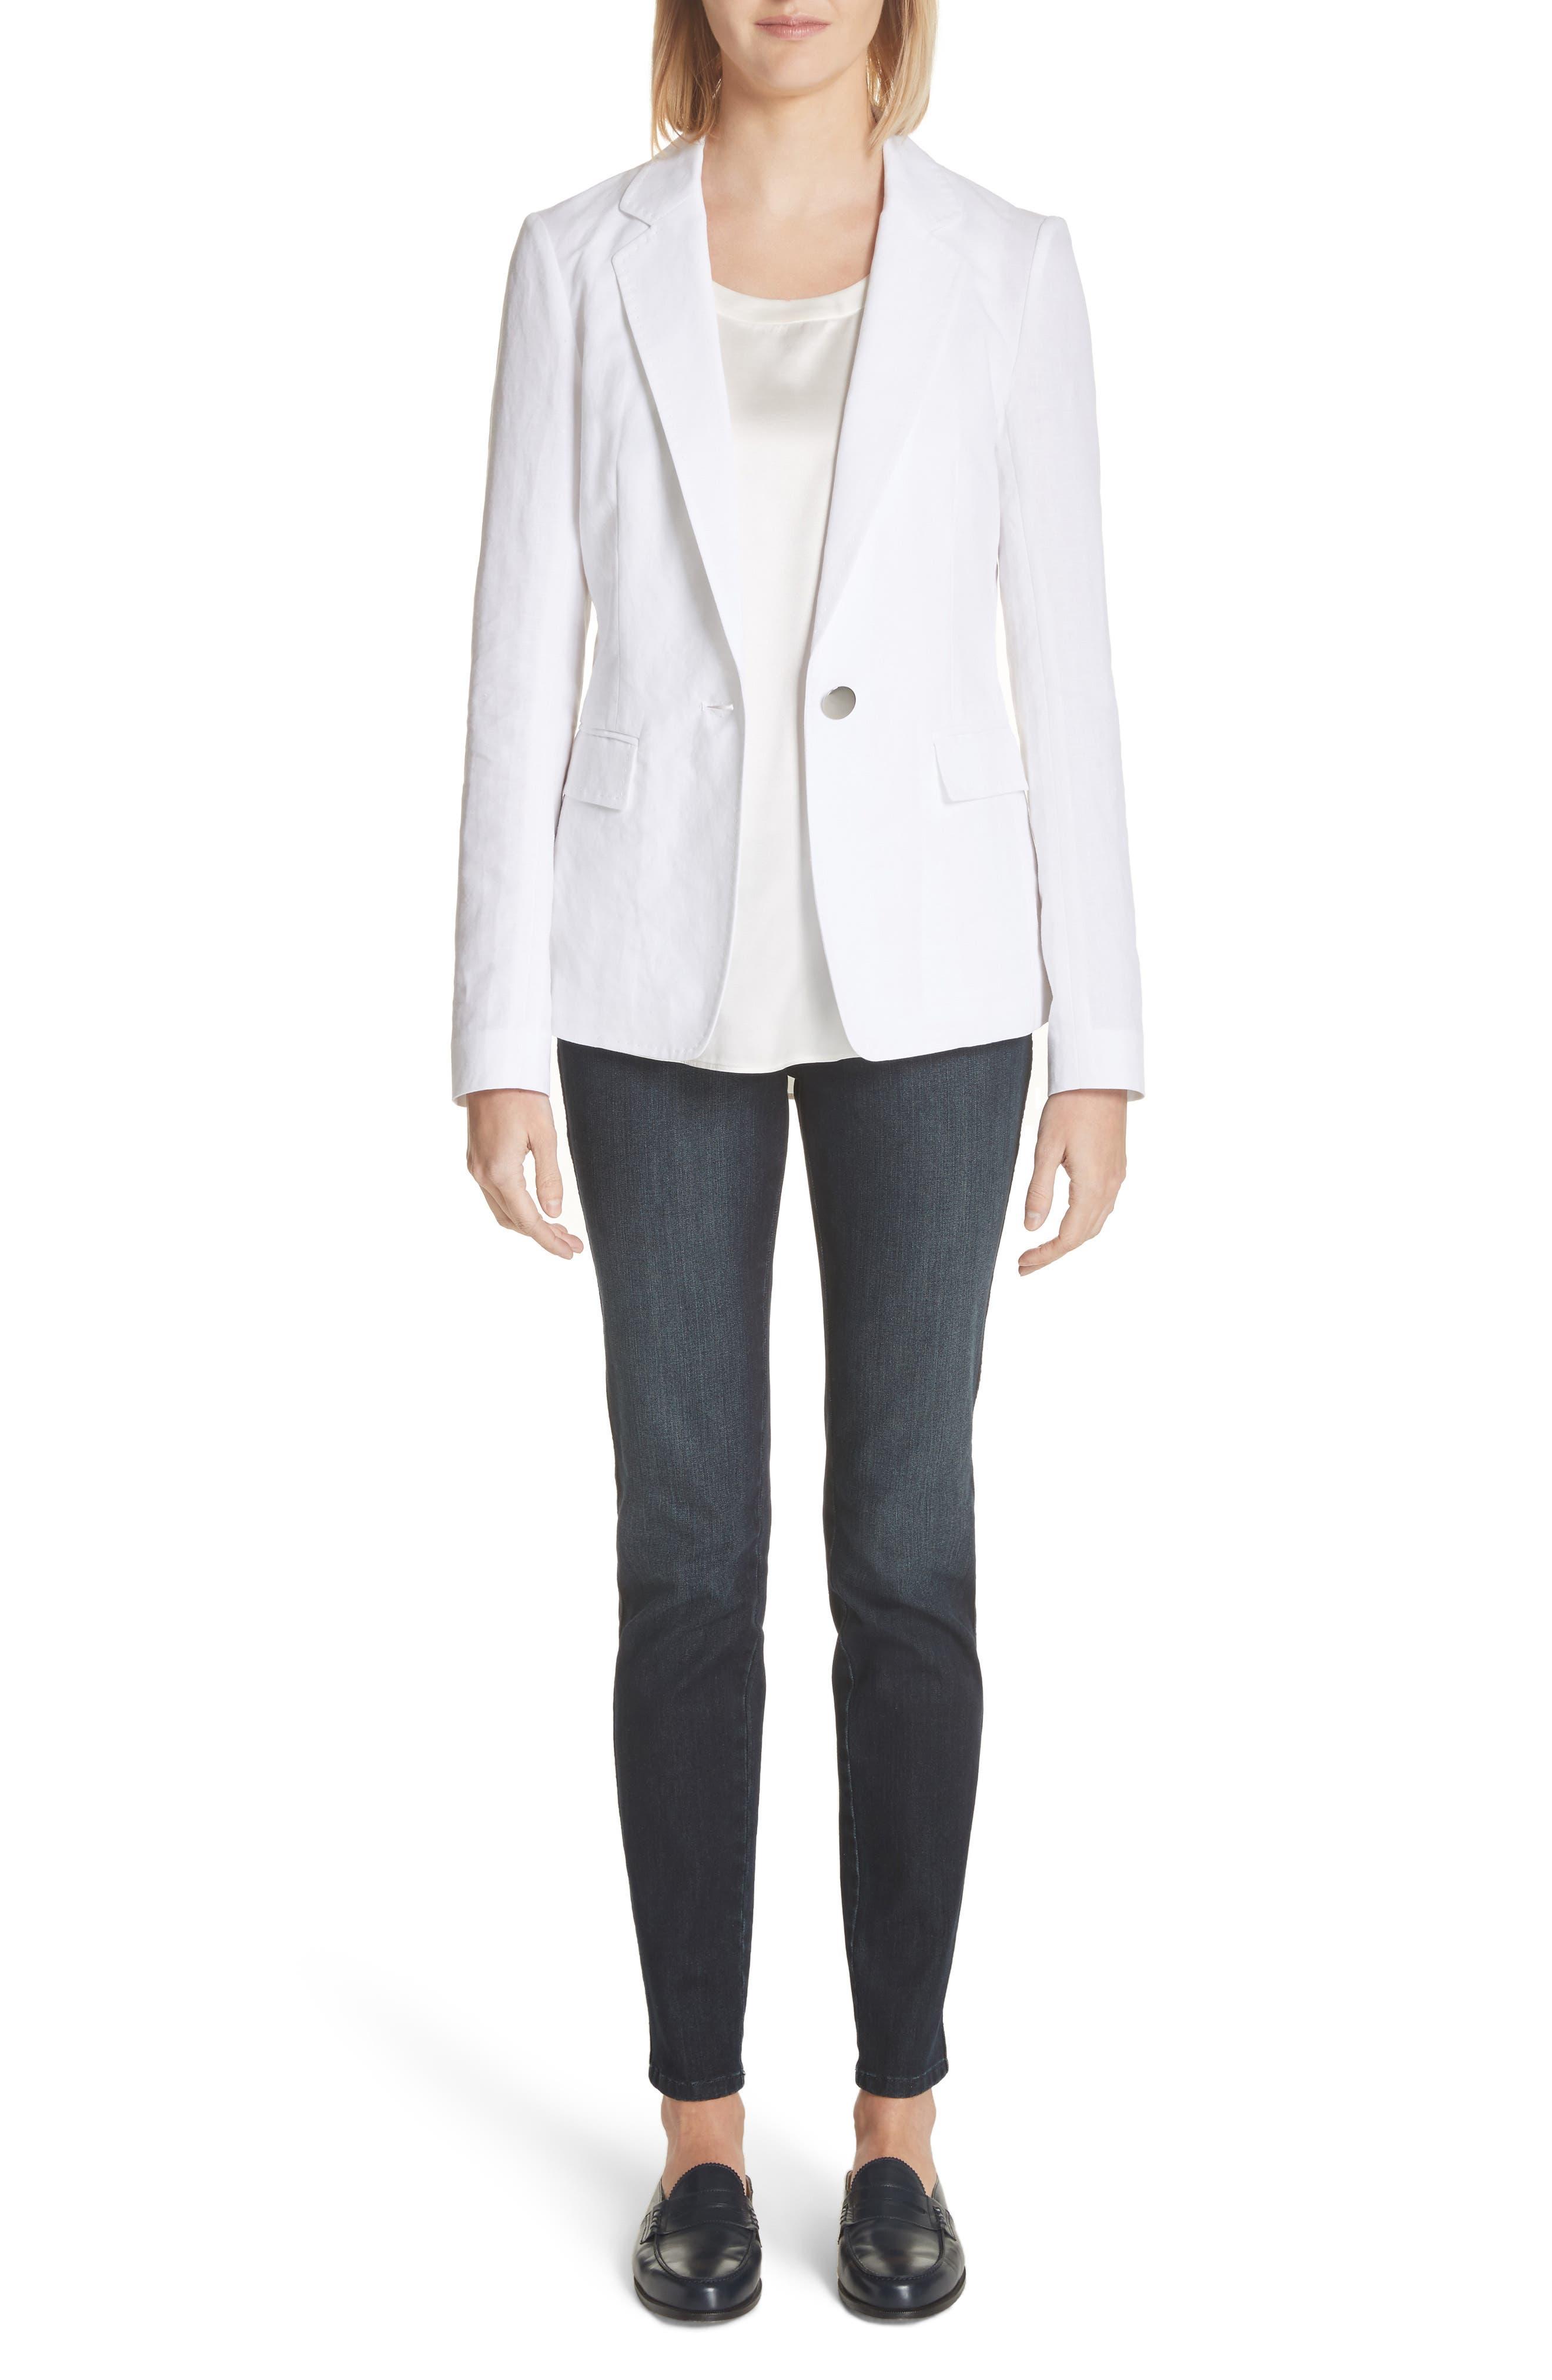 Lyndon Courtly Cotton & Linen Jacket,                             Alternate thumbnail 7, color,                             White